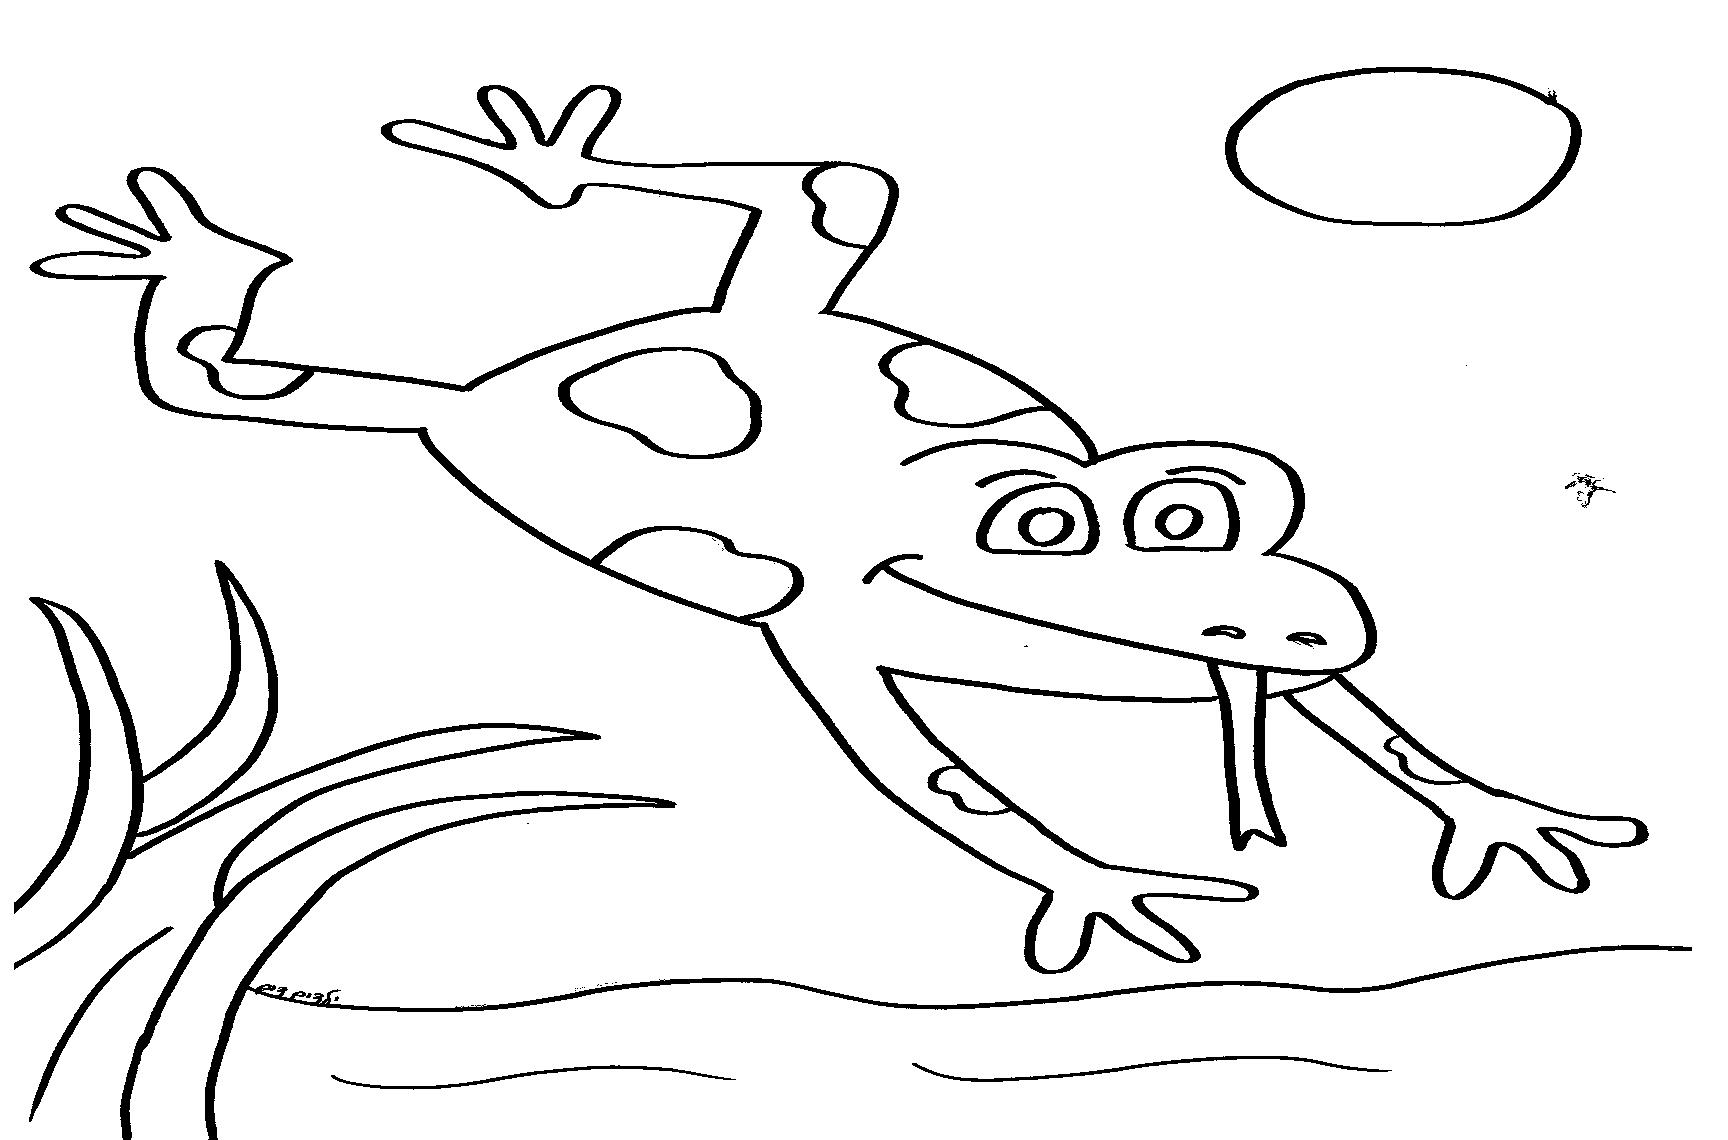 דף צביעה צפרדע